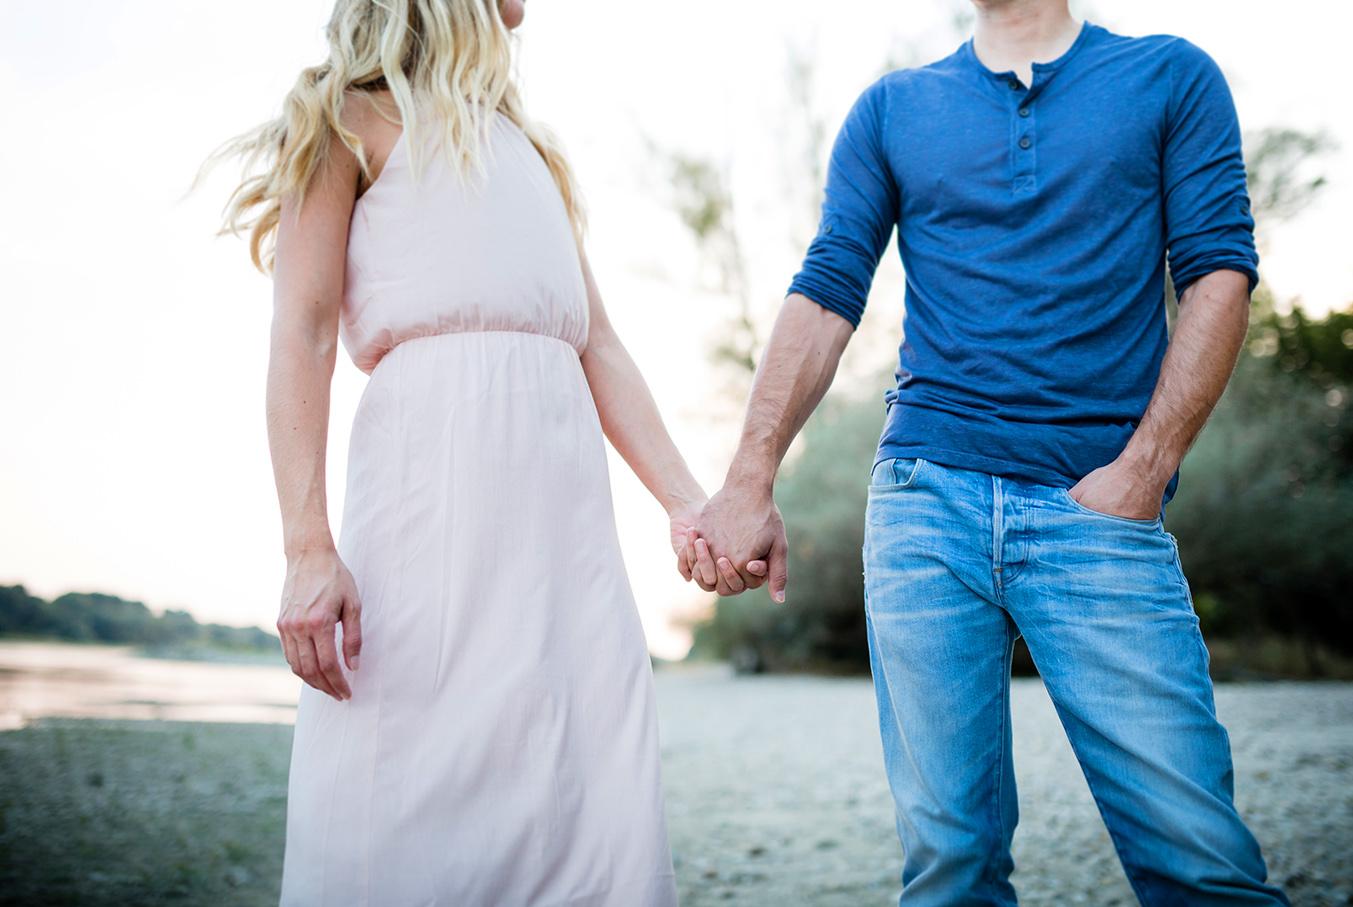 Vienna_Wien_Couple_Hochzeit_Paar_Verlobung_Engagement_Shooting_24